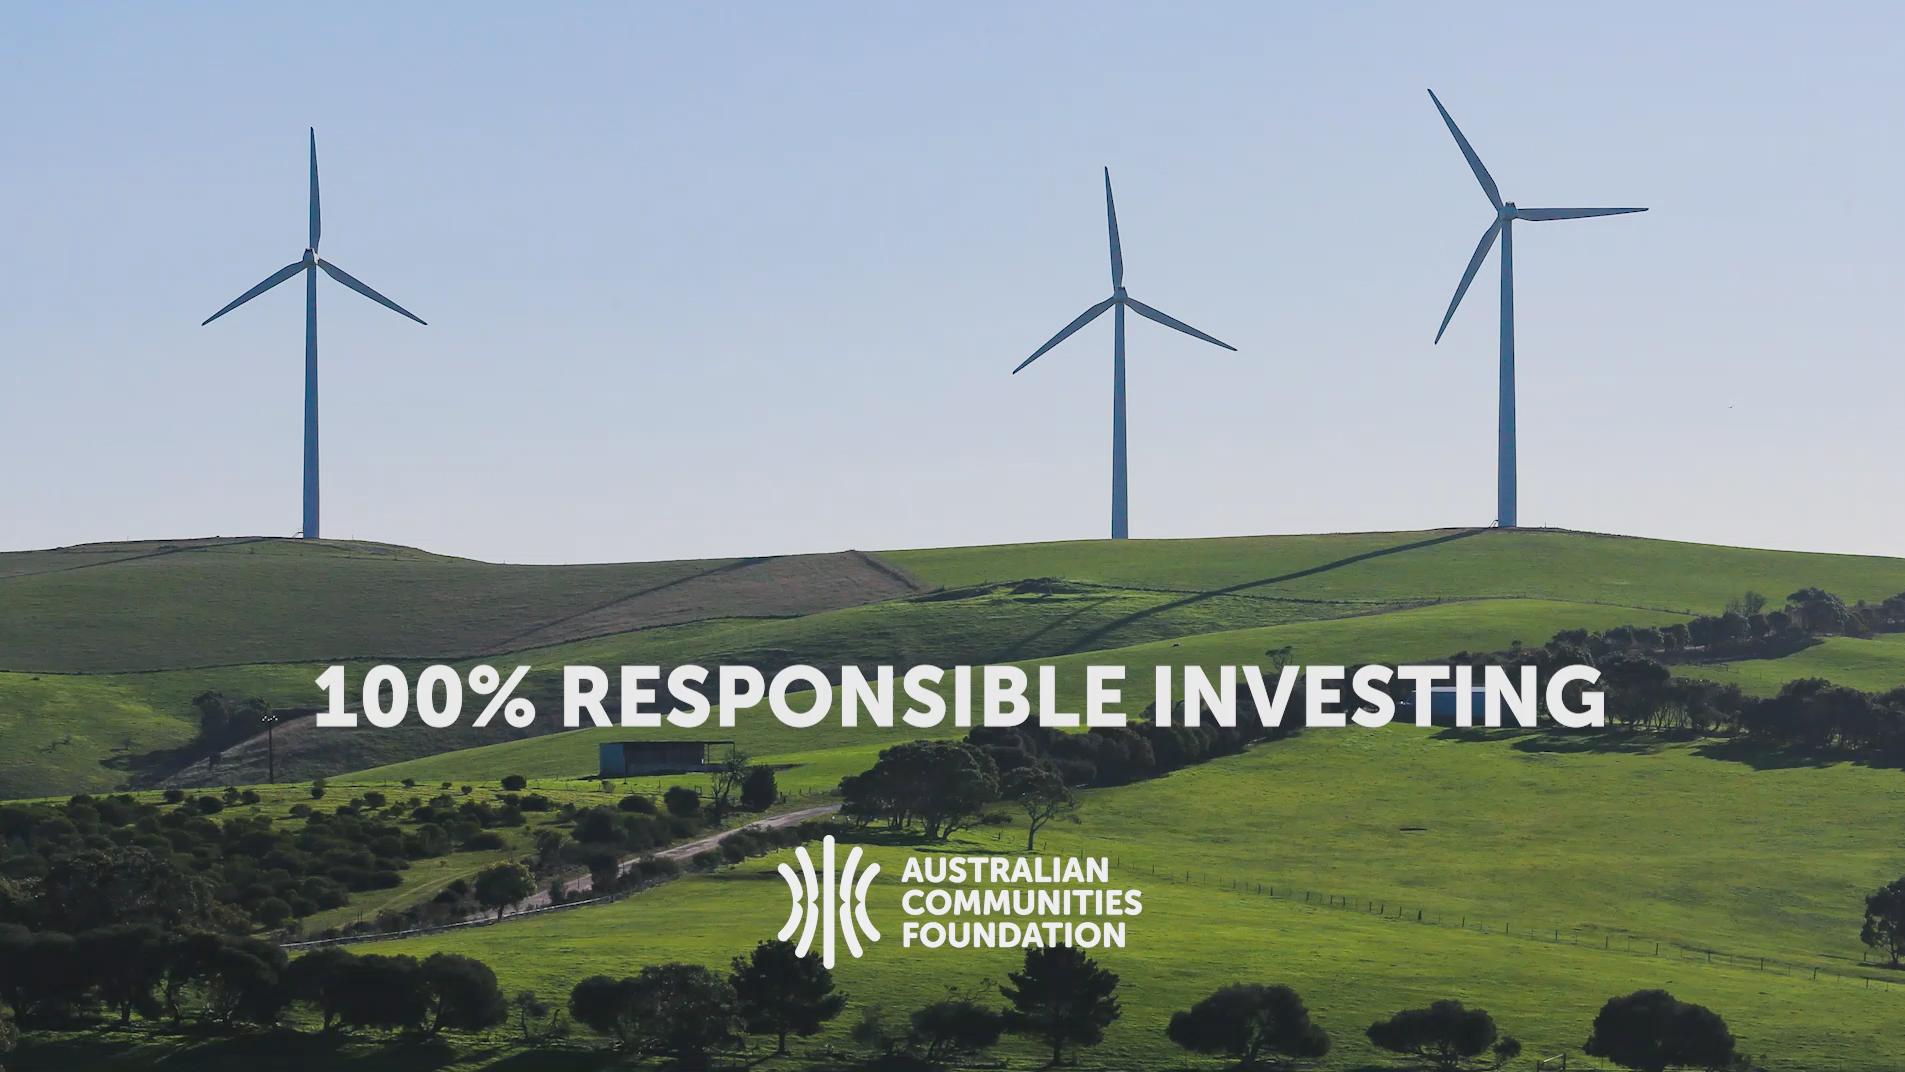 100% Responsible Investing